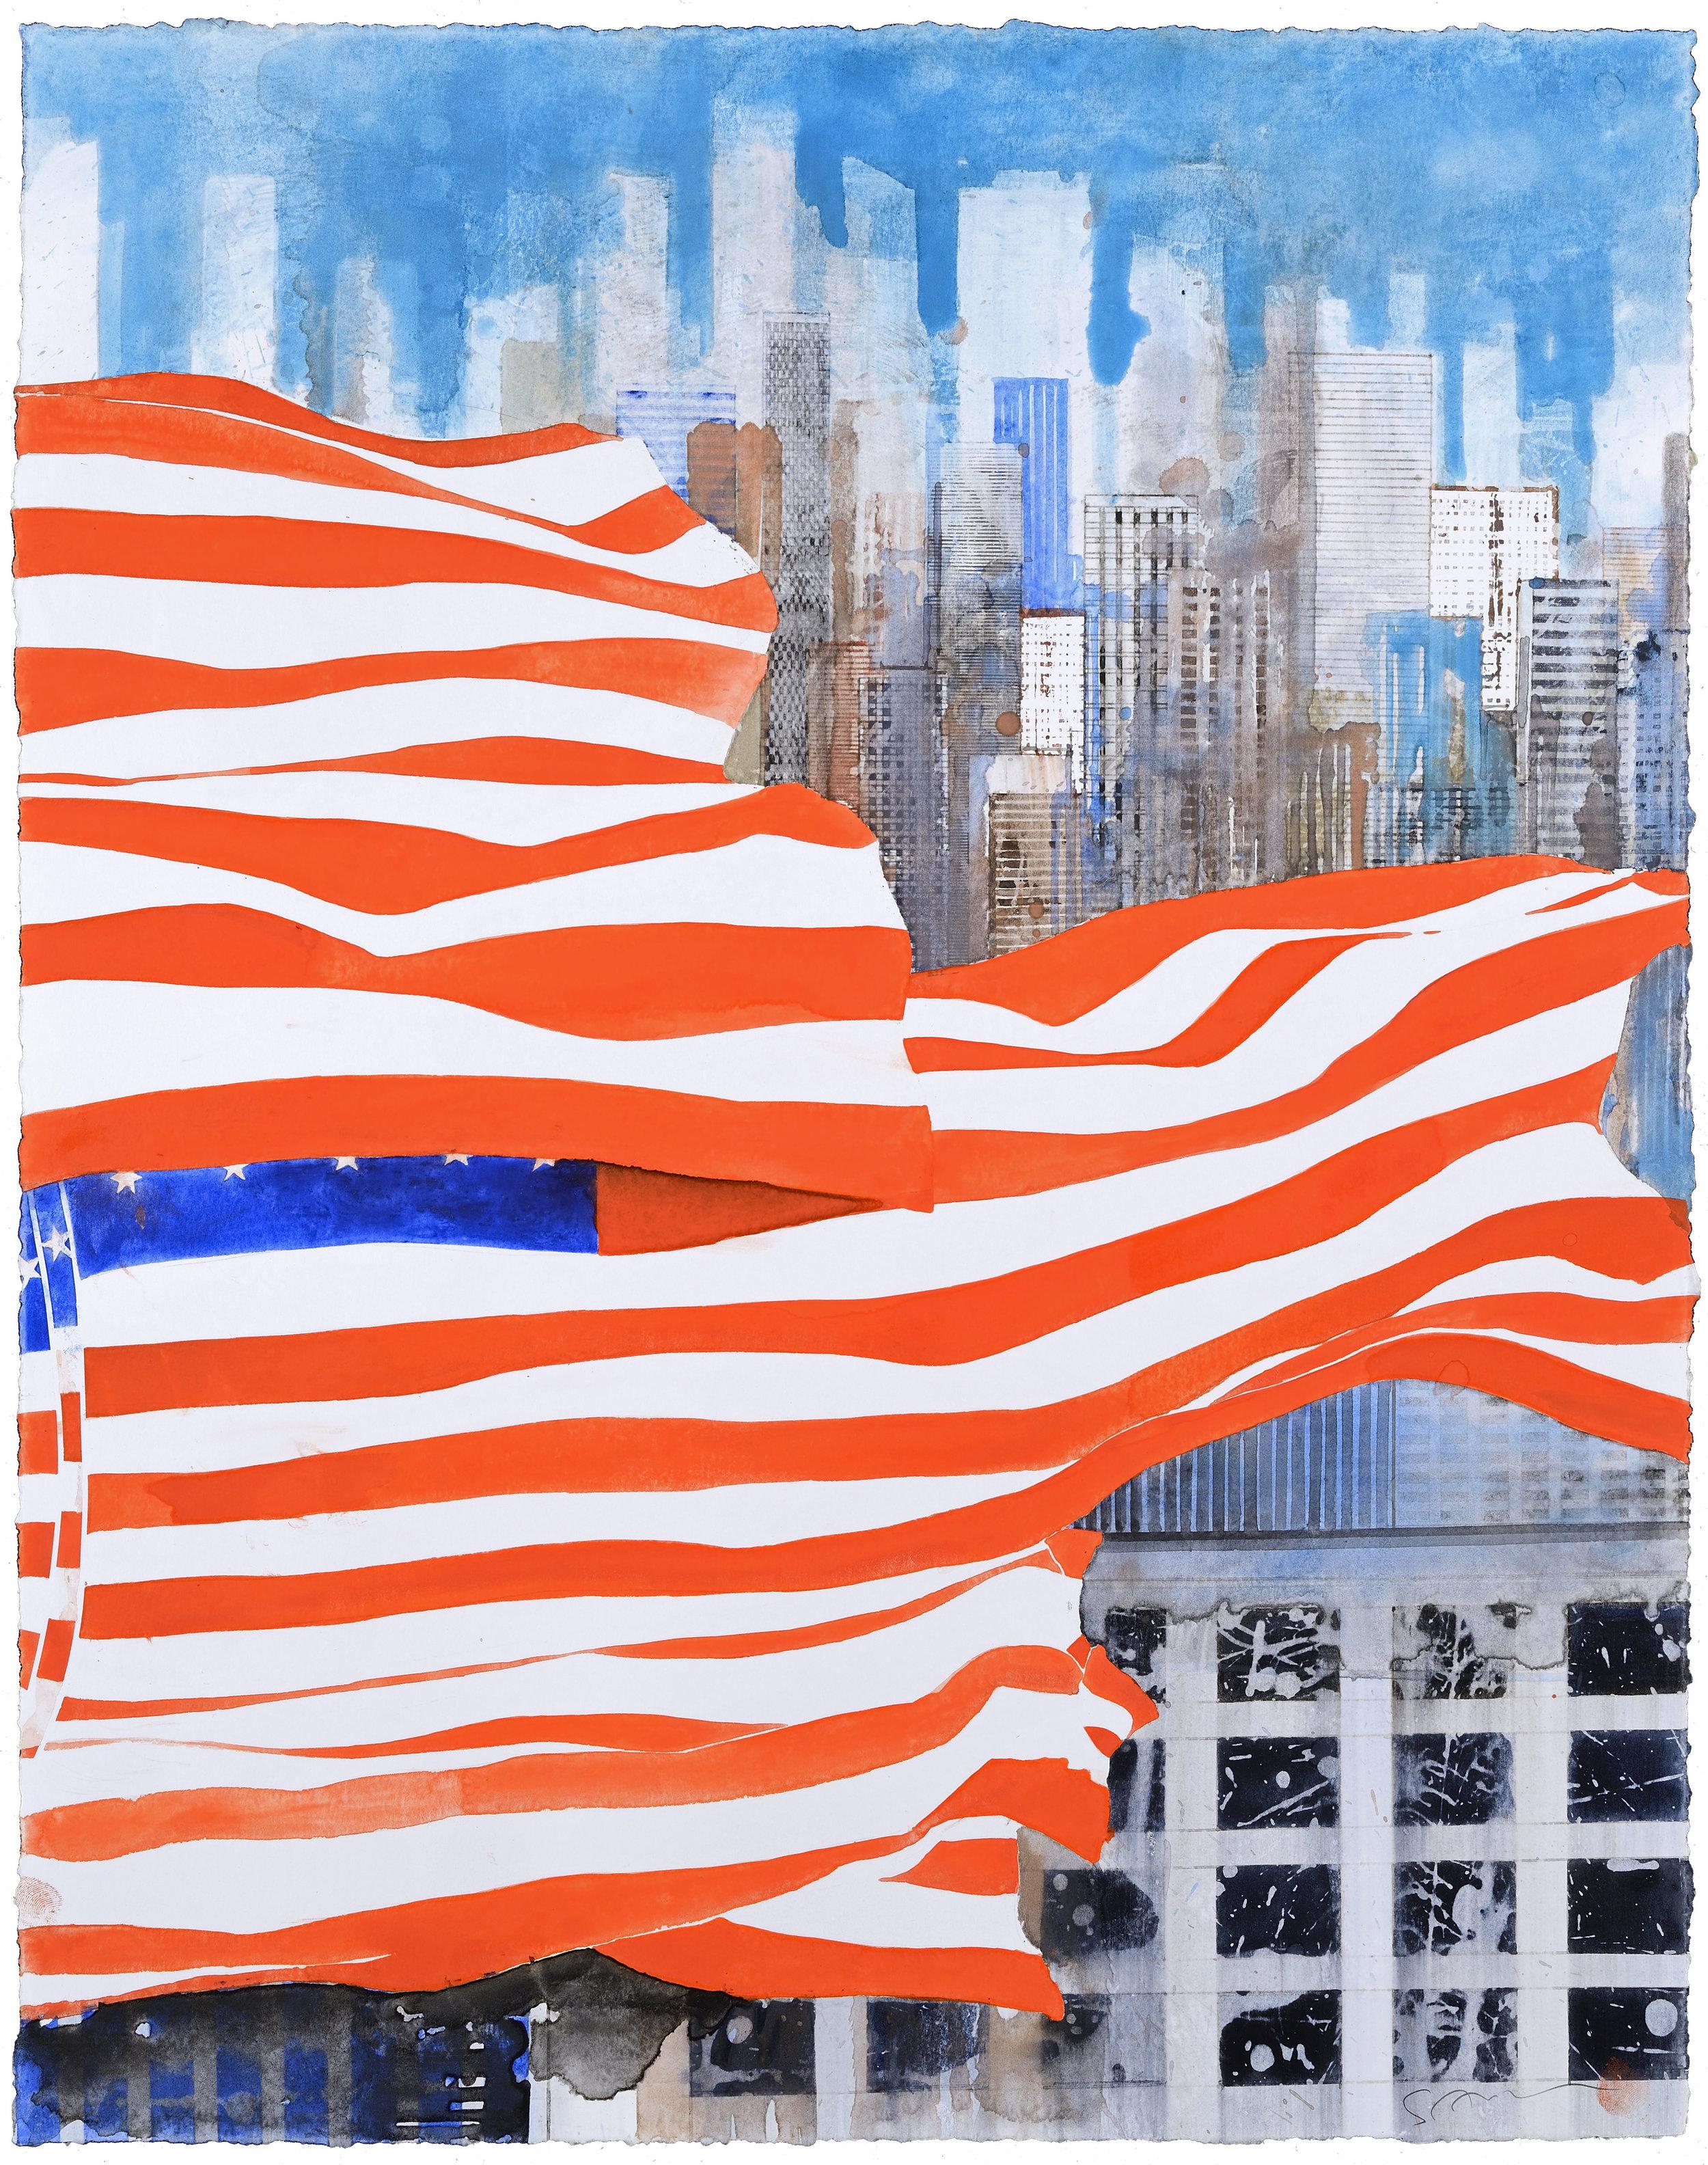 US Flag III, watercolor, 61 x 48 cm, 24 x 19 in, 2015